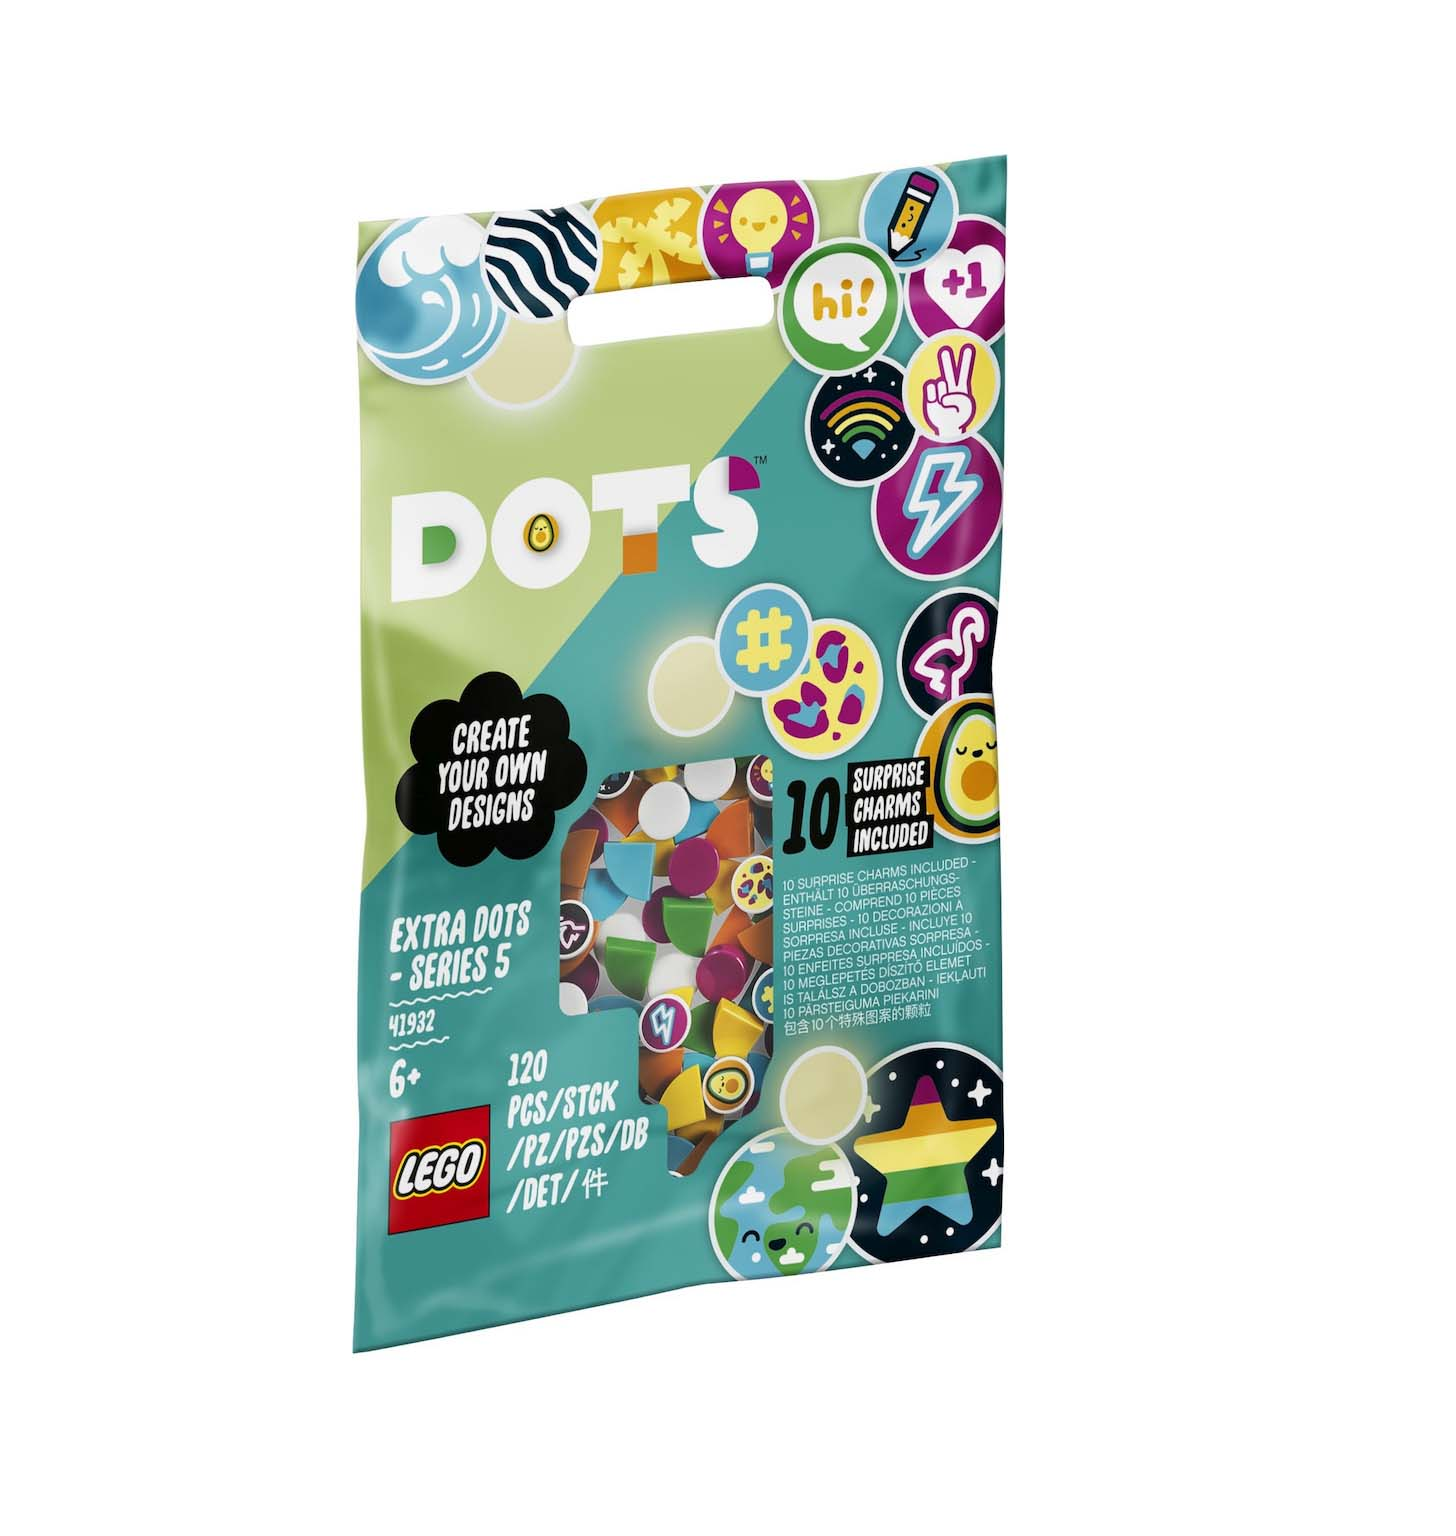 Lego Dots: Extra Dots Series 5 41932